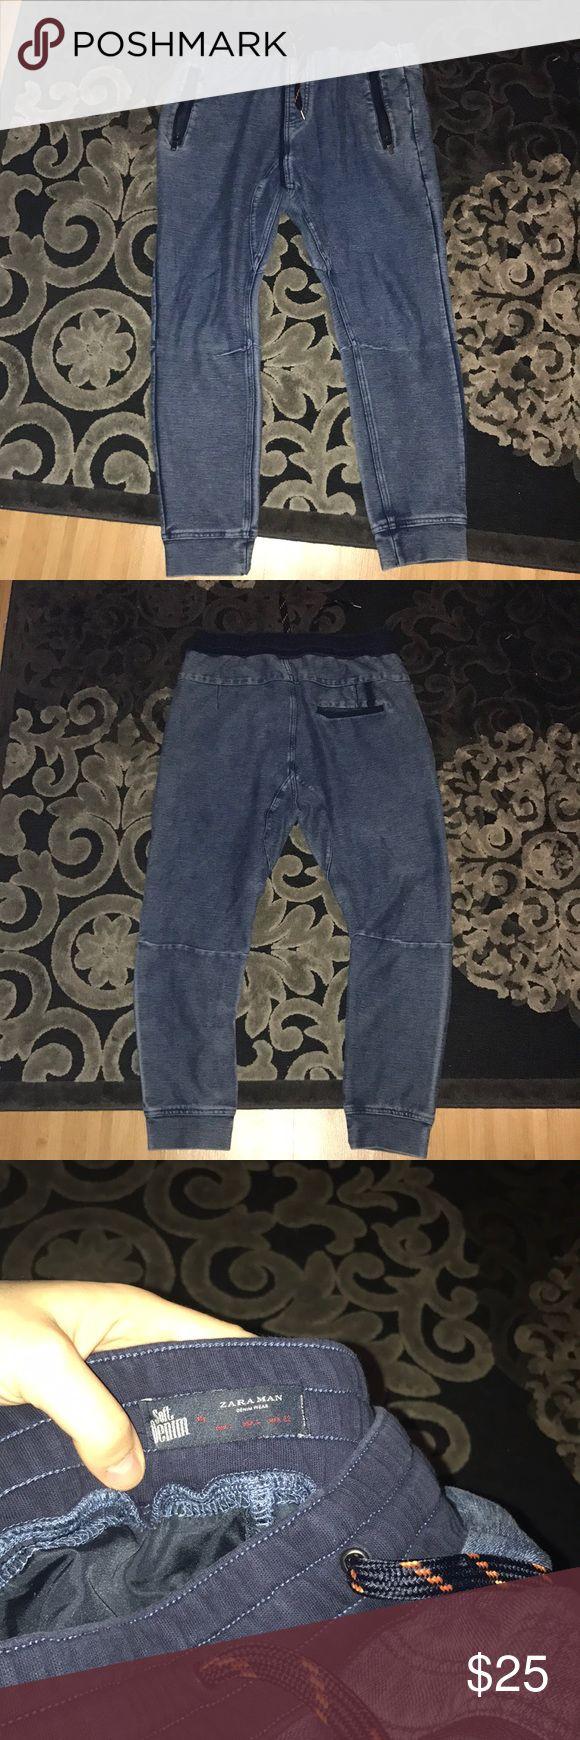 Zara Man Soft Denim joggers These are super soft denim joggers men's size LG. Zara Pants Sweatpants & Joggers